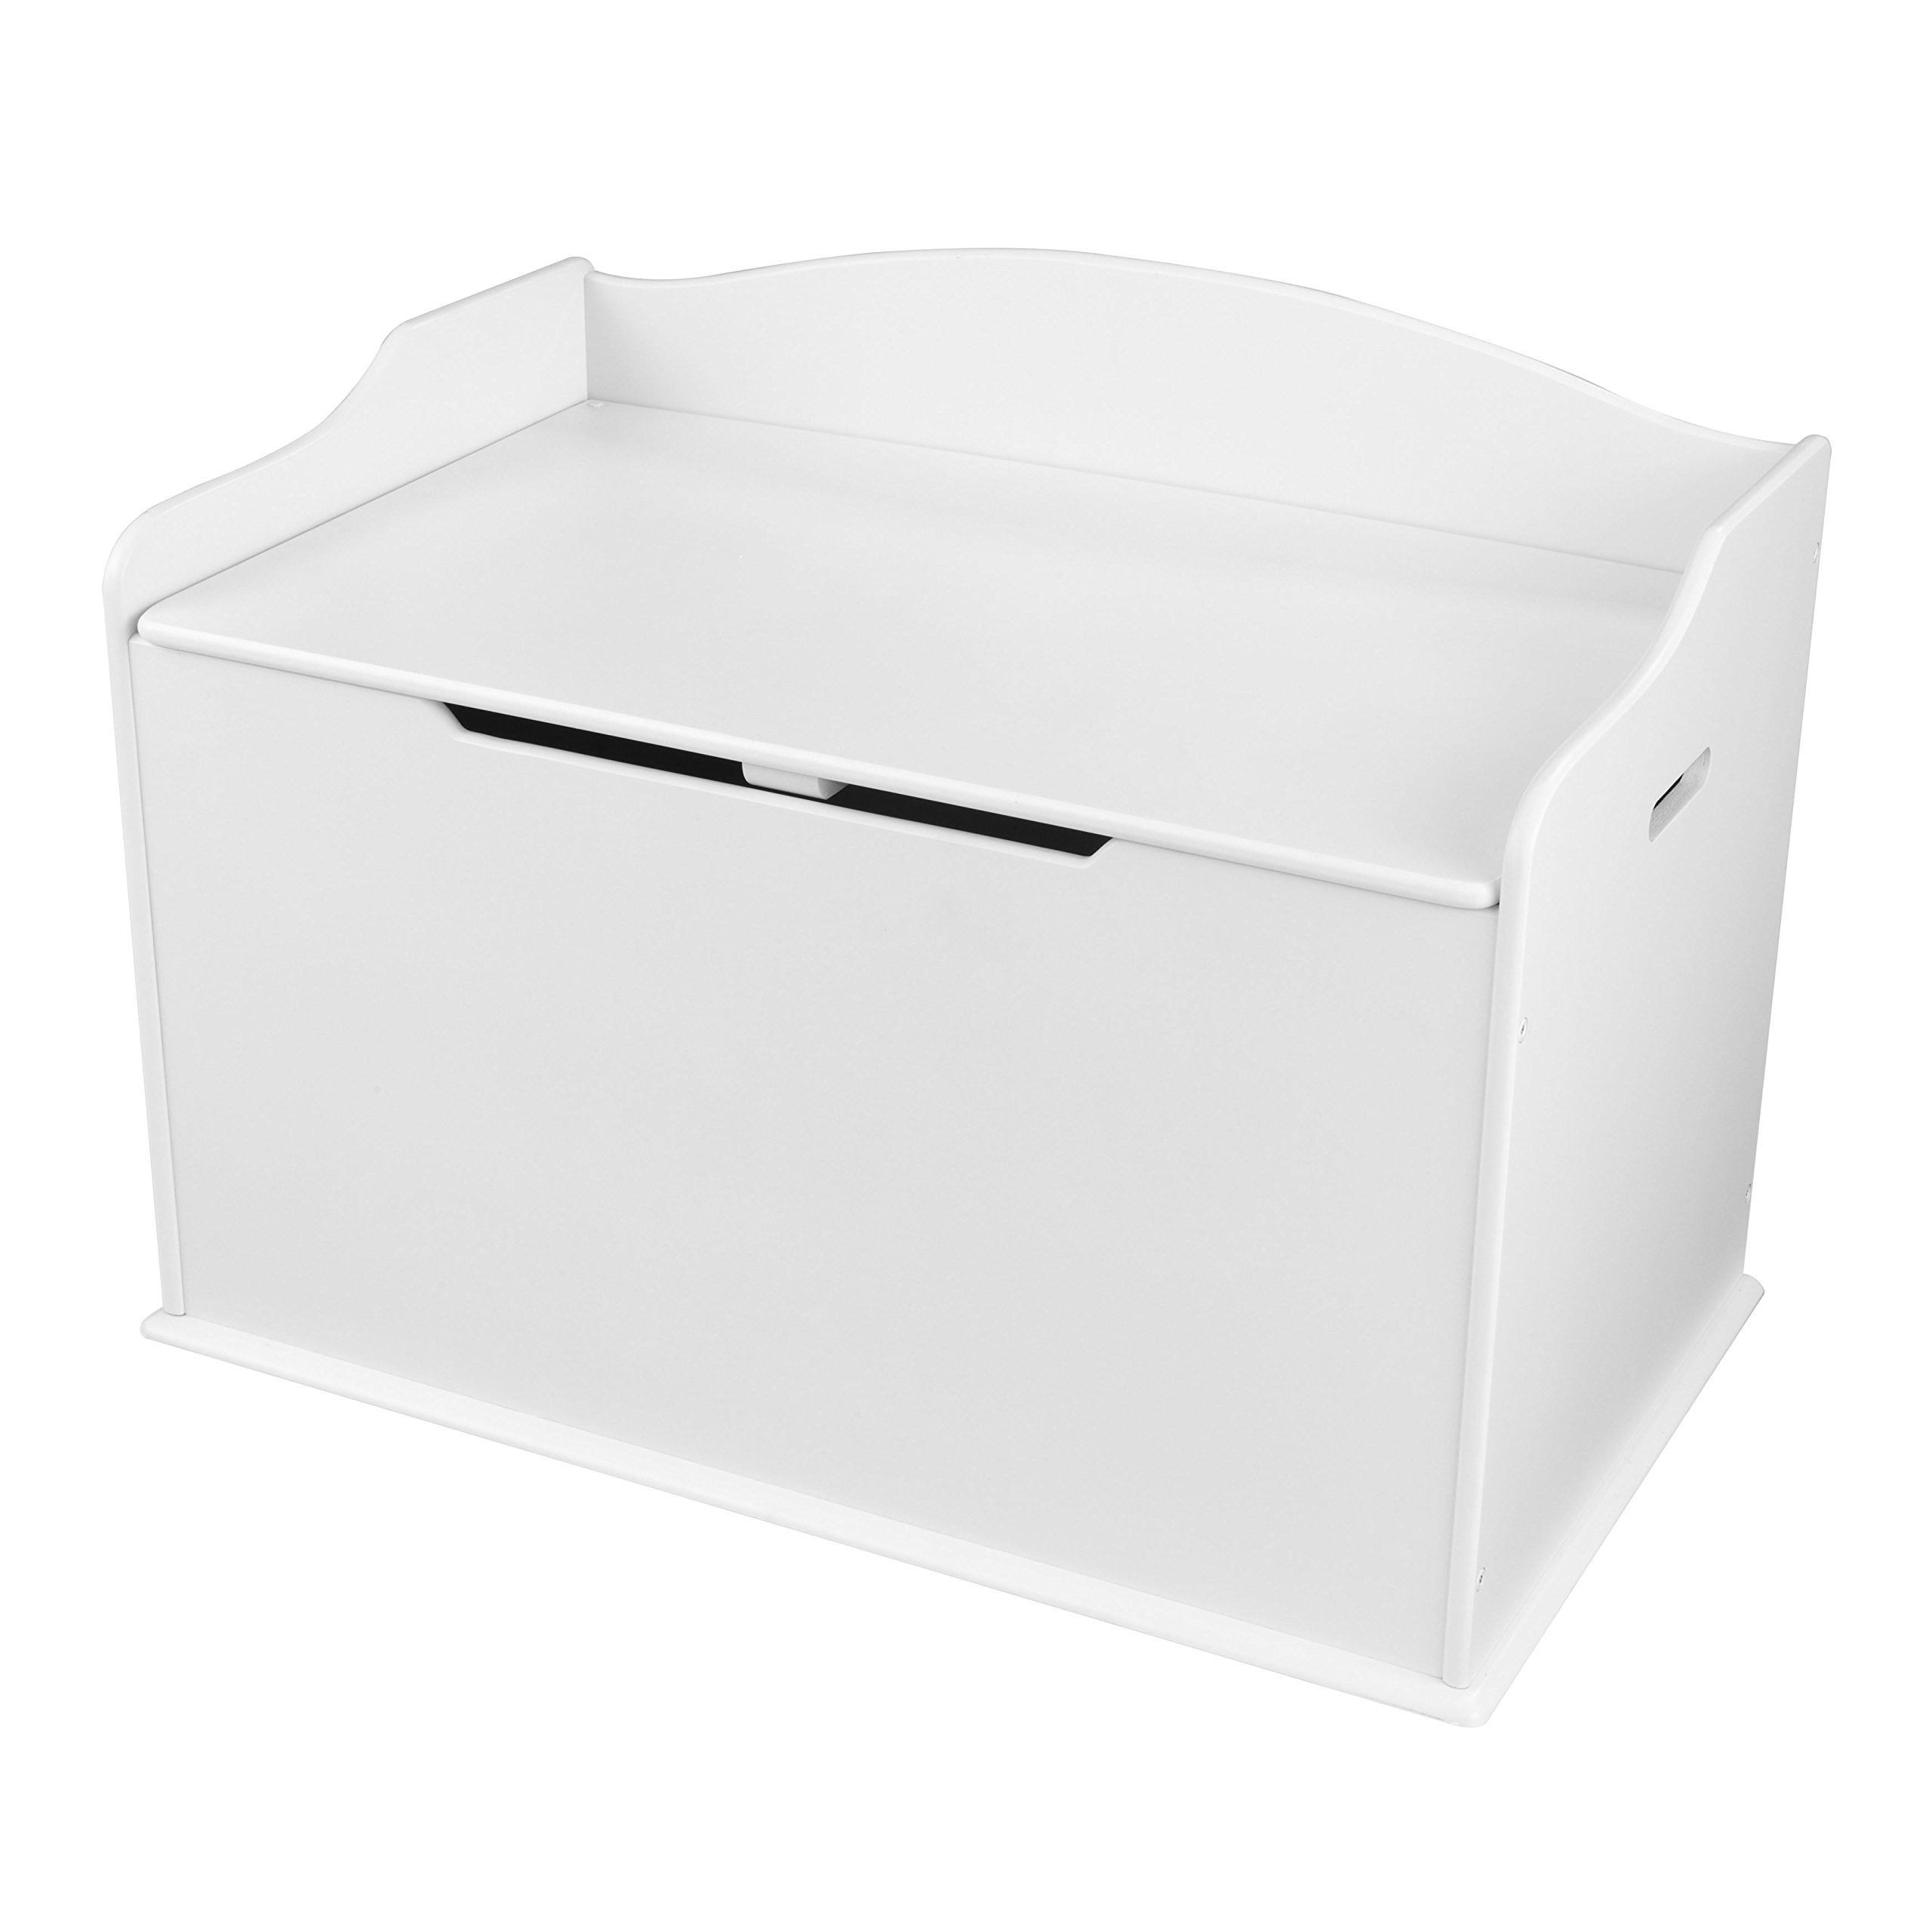 KidKraft Austin Toy Box White